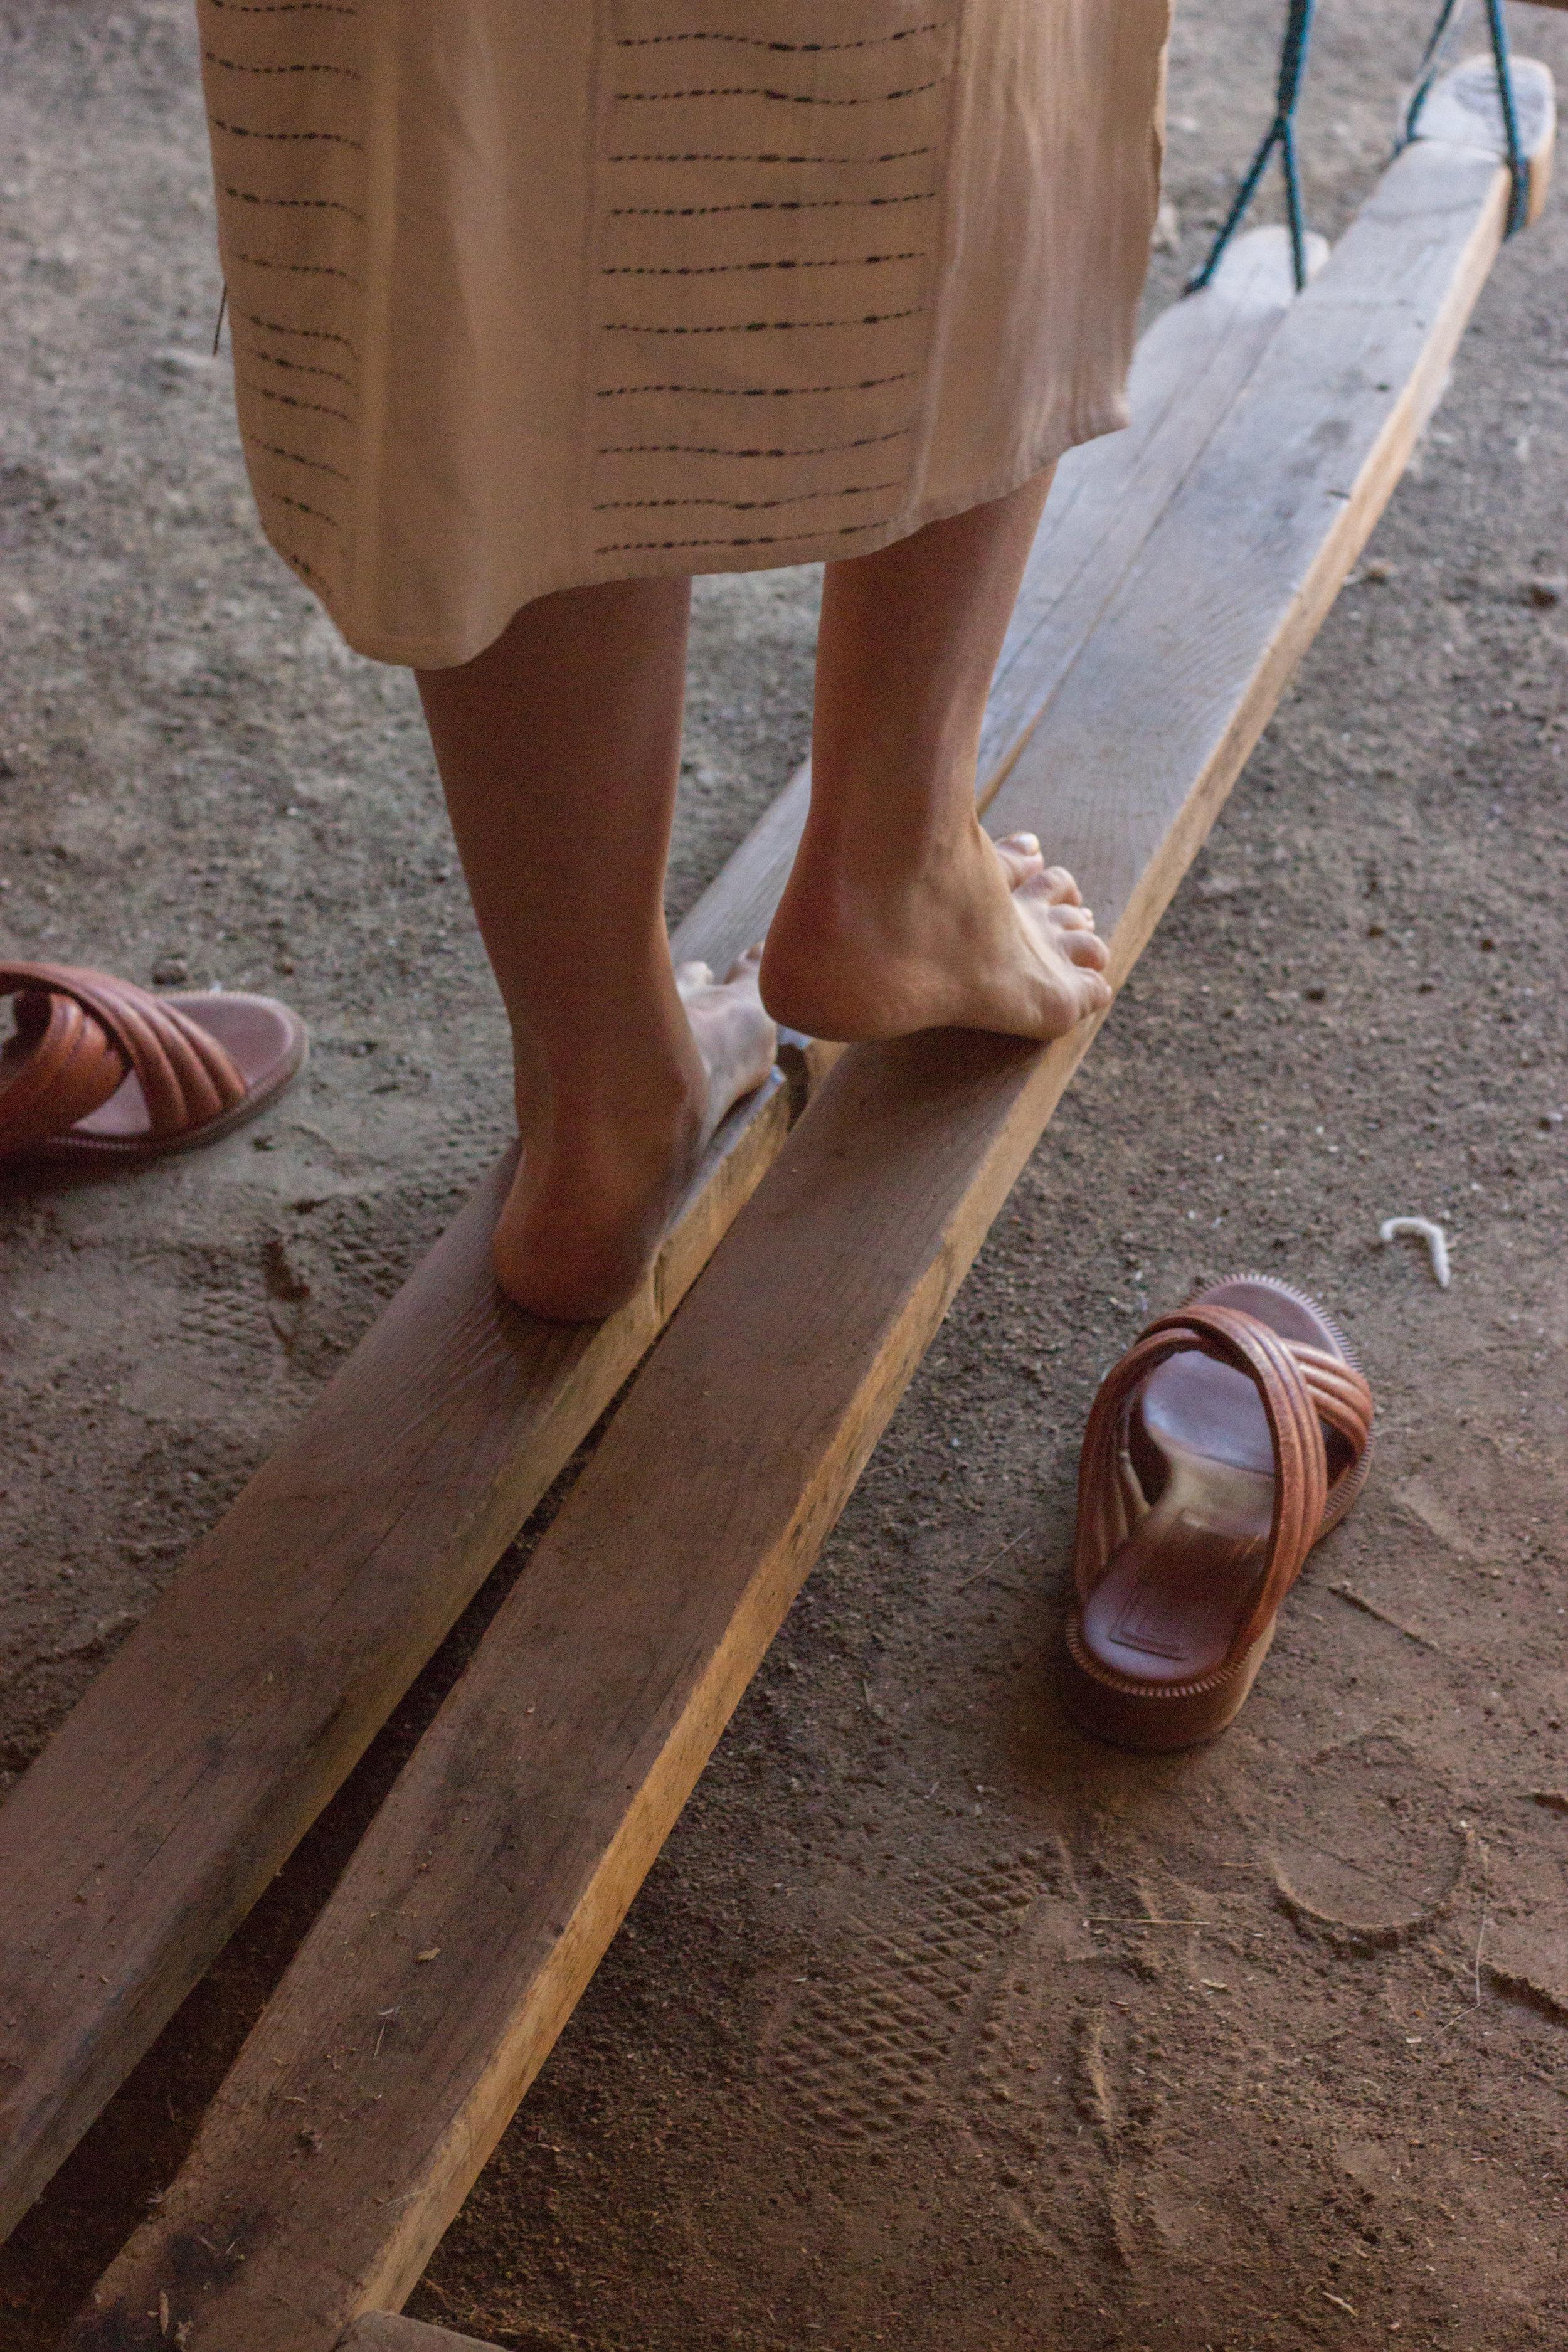 emily katz footloom weaving in oaxaca by leah pellegrini for thread caravan.jpg